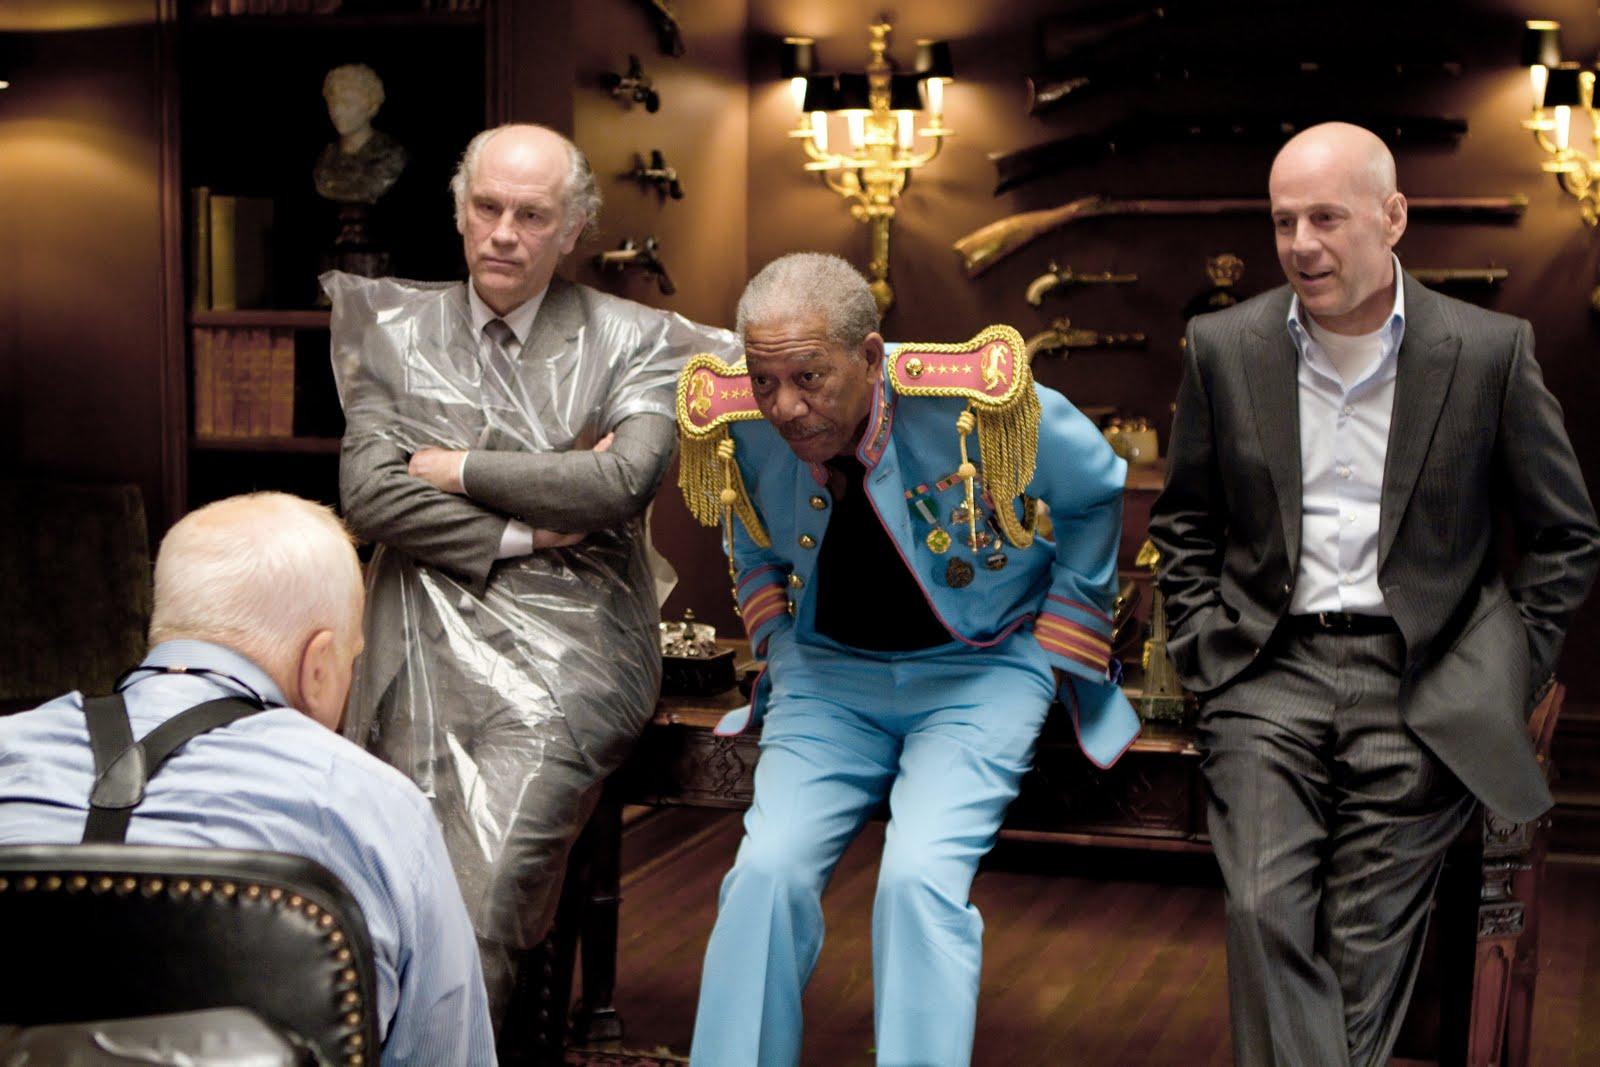 http://4.bp.blogspot.com/_dzcPSyuN2Nk/TLpPRp457AI/AAAAAAAABNo/rOHlbebZQnU/s1600/Red_Movie_Image-_Bruce_Willis_Morgan_Freeman.jpg